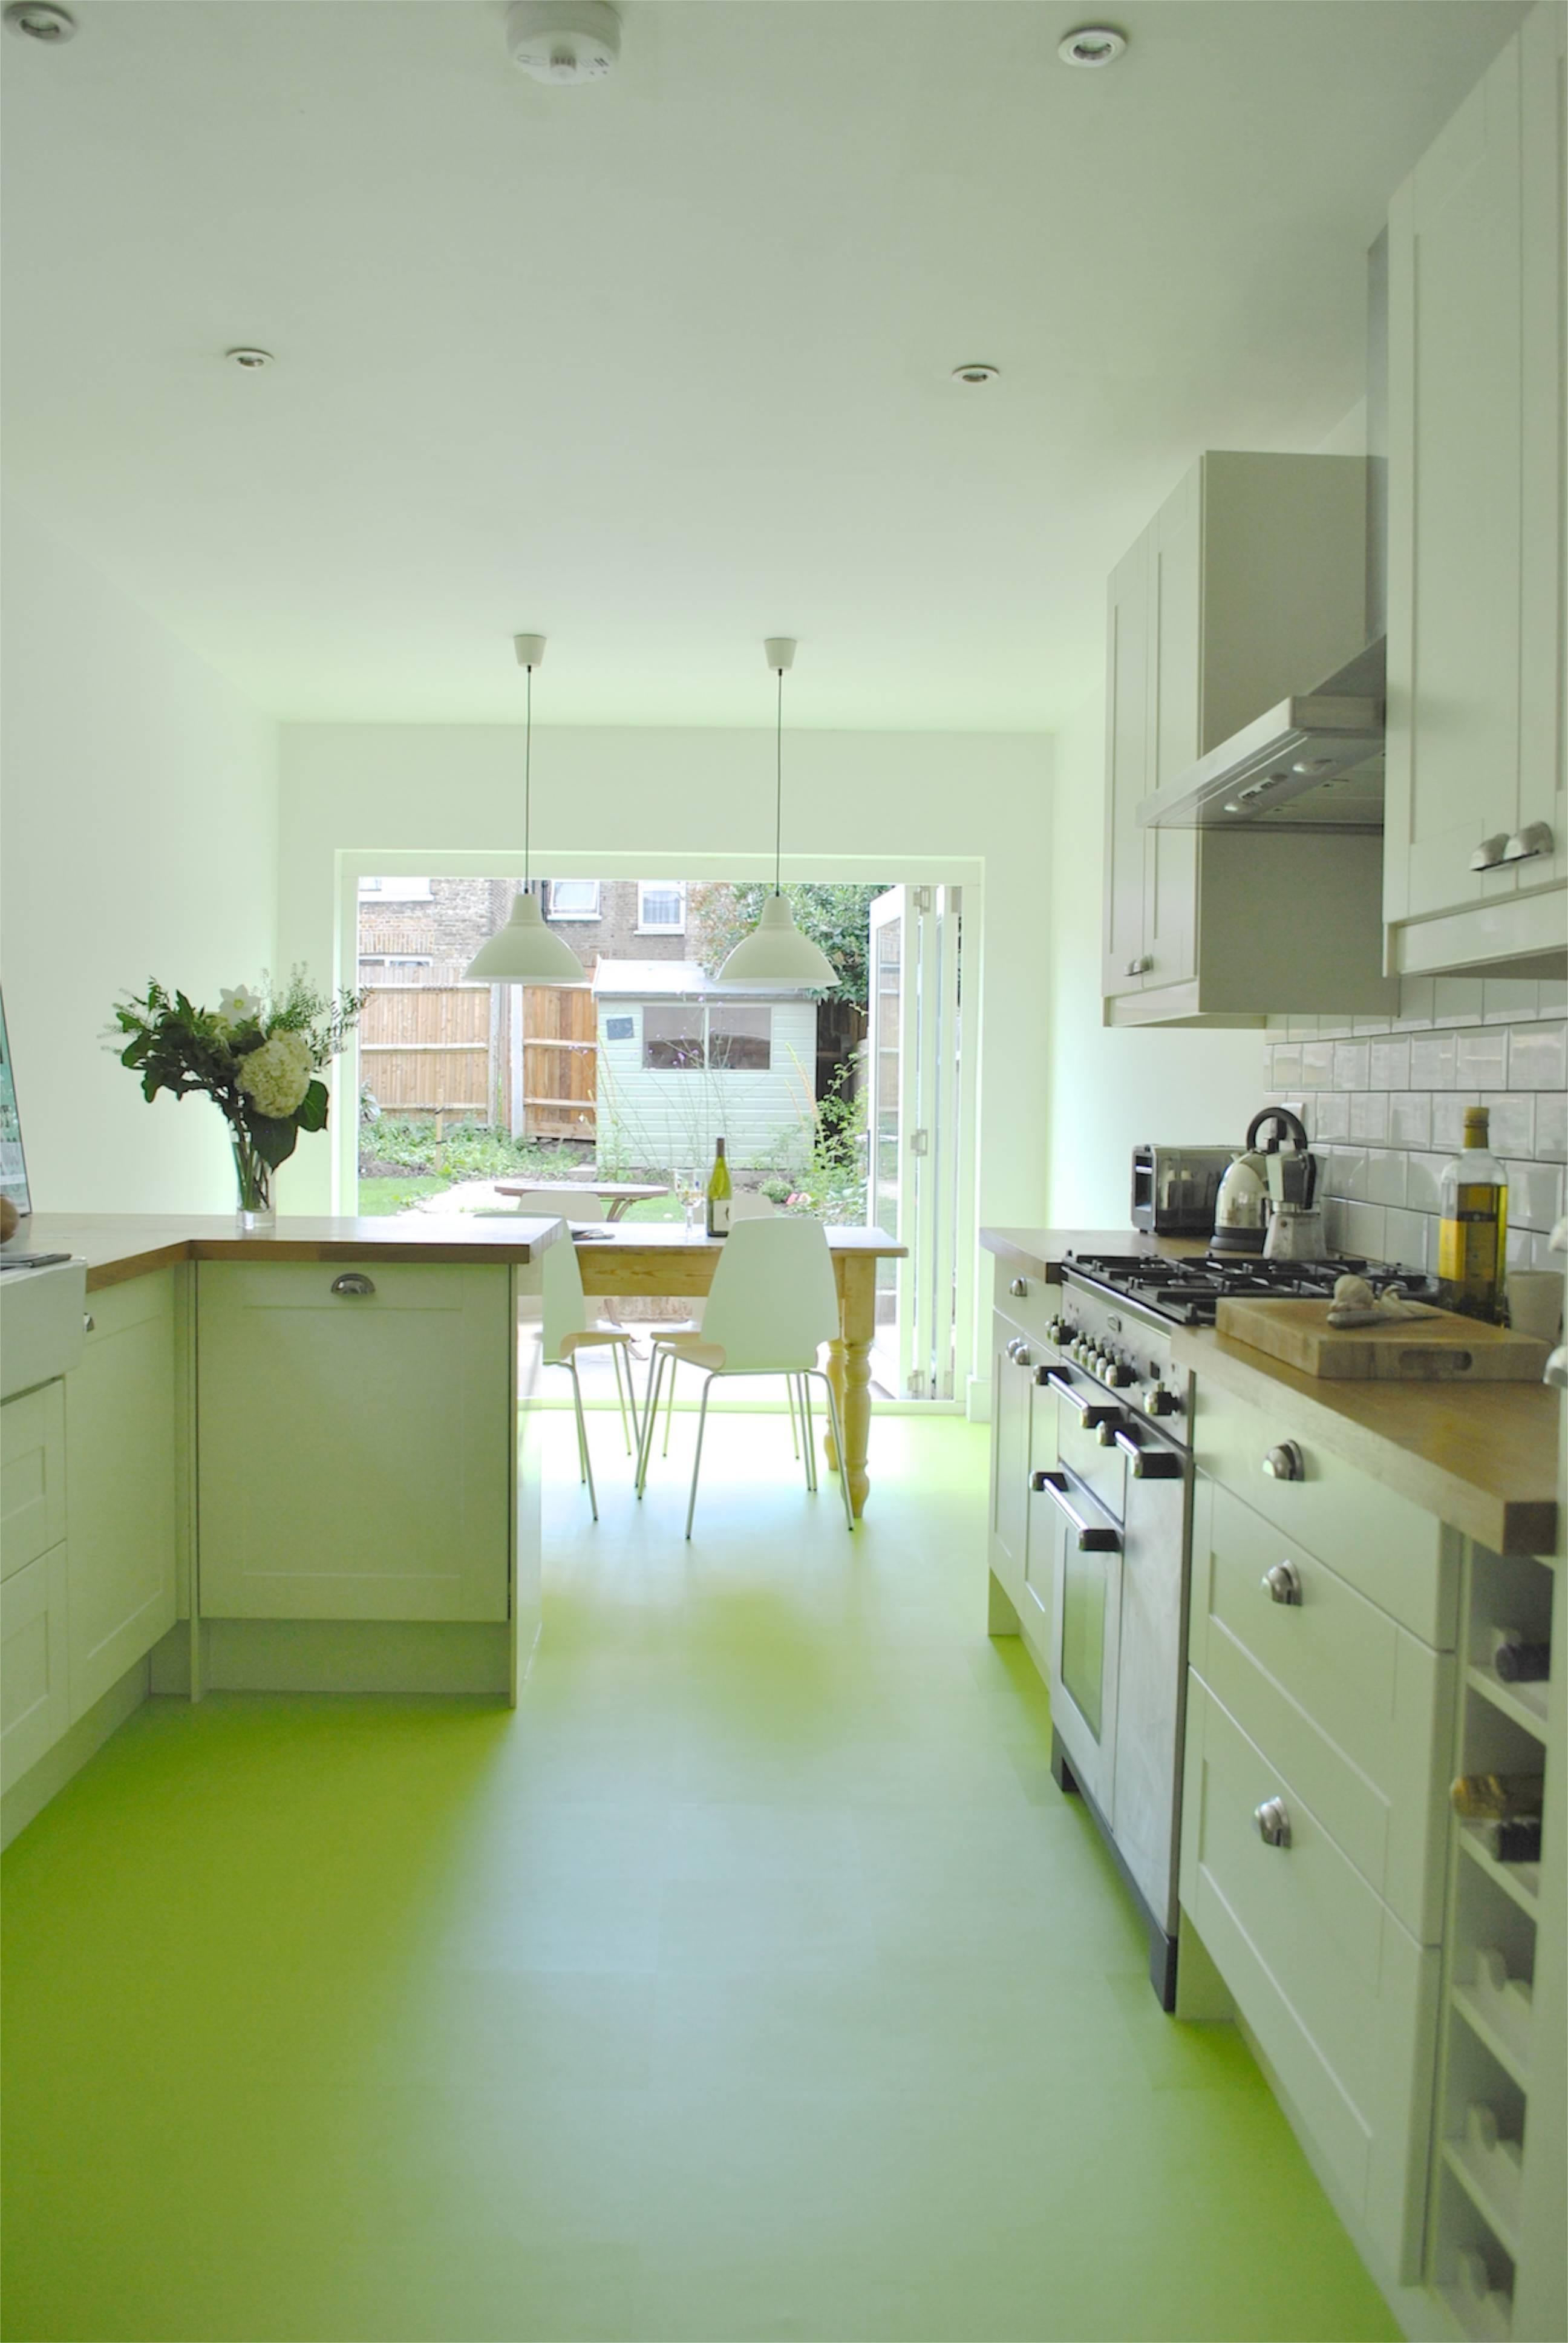 green color kitchen floor image